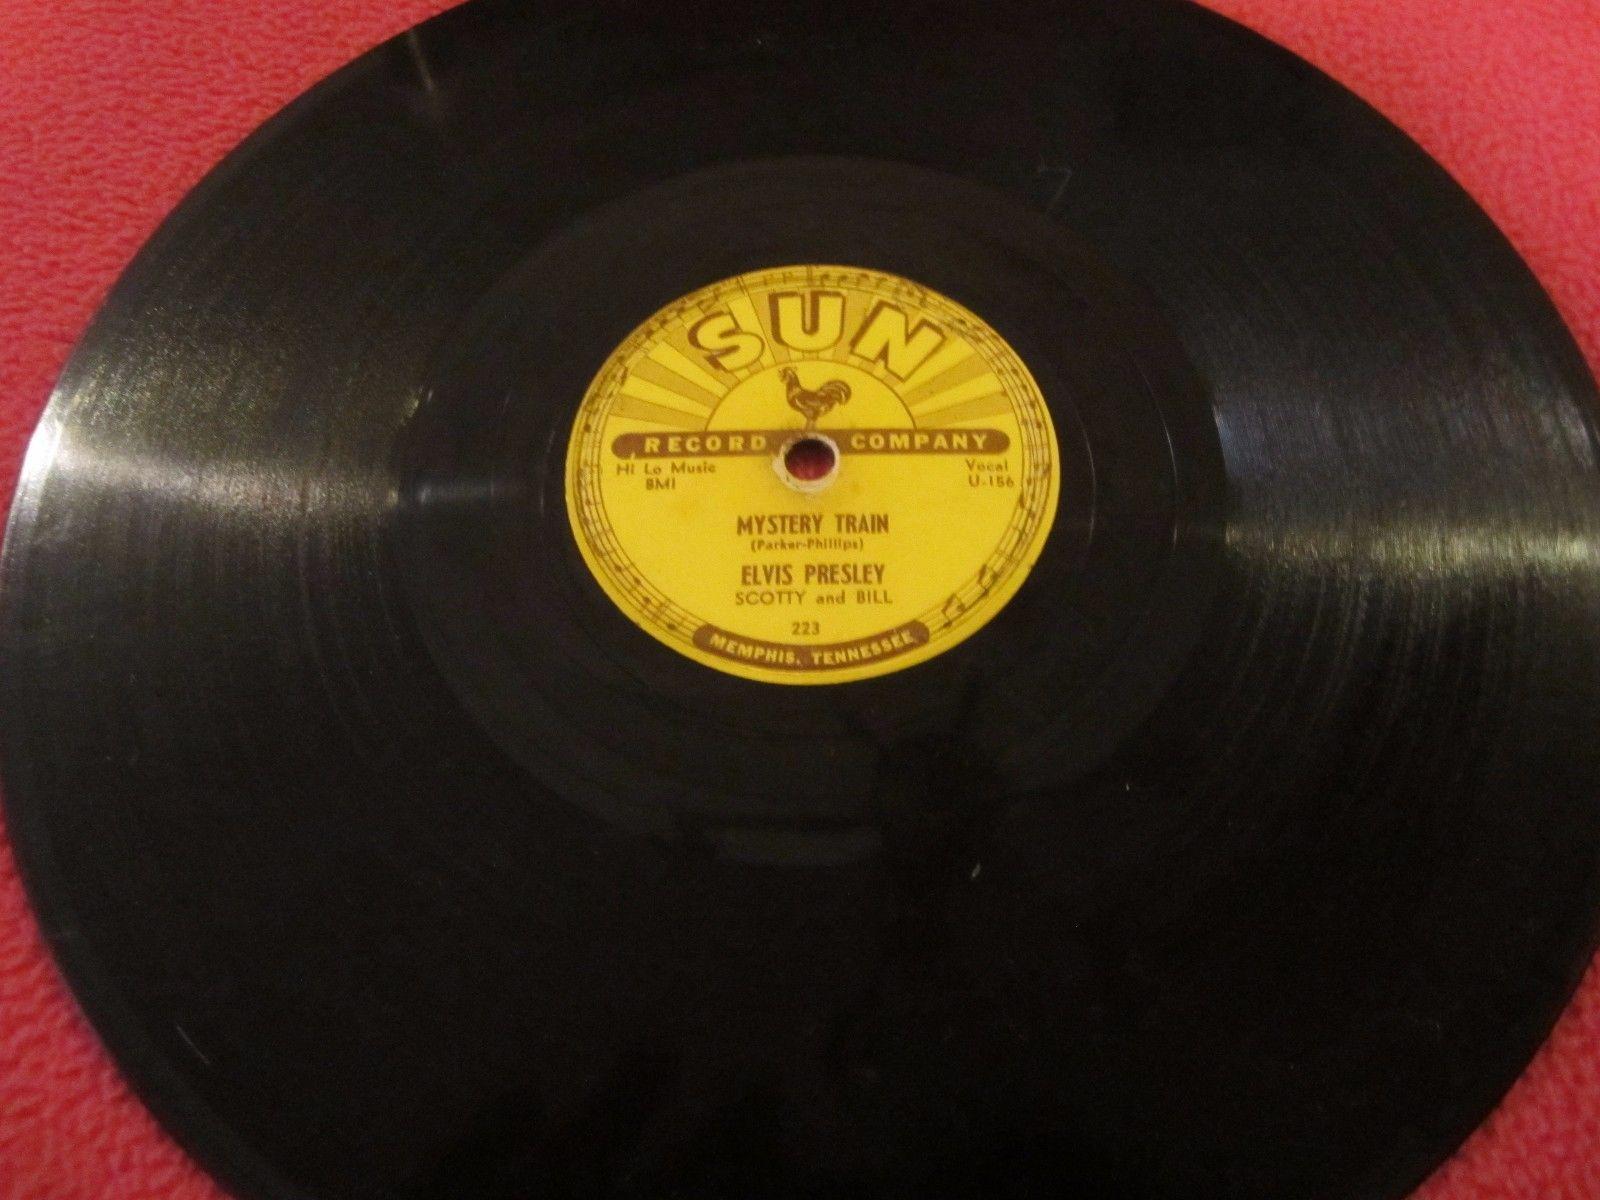 ELVIS PRESLEY 1955 ORIGINAL SUN 78 RECORD MATRIX # TRAIL OFF MYSTERY TRAIN NICE! https://t.co/84NiF4hD8t https://t.co/1Asg45mpZp